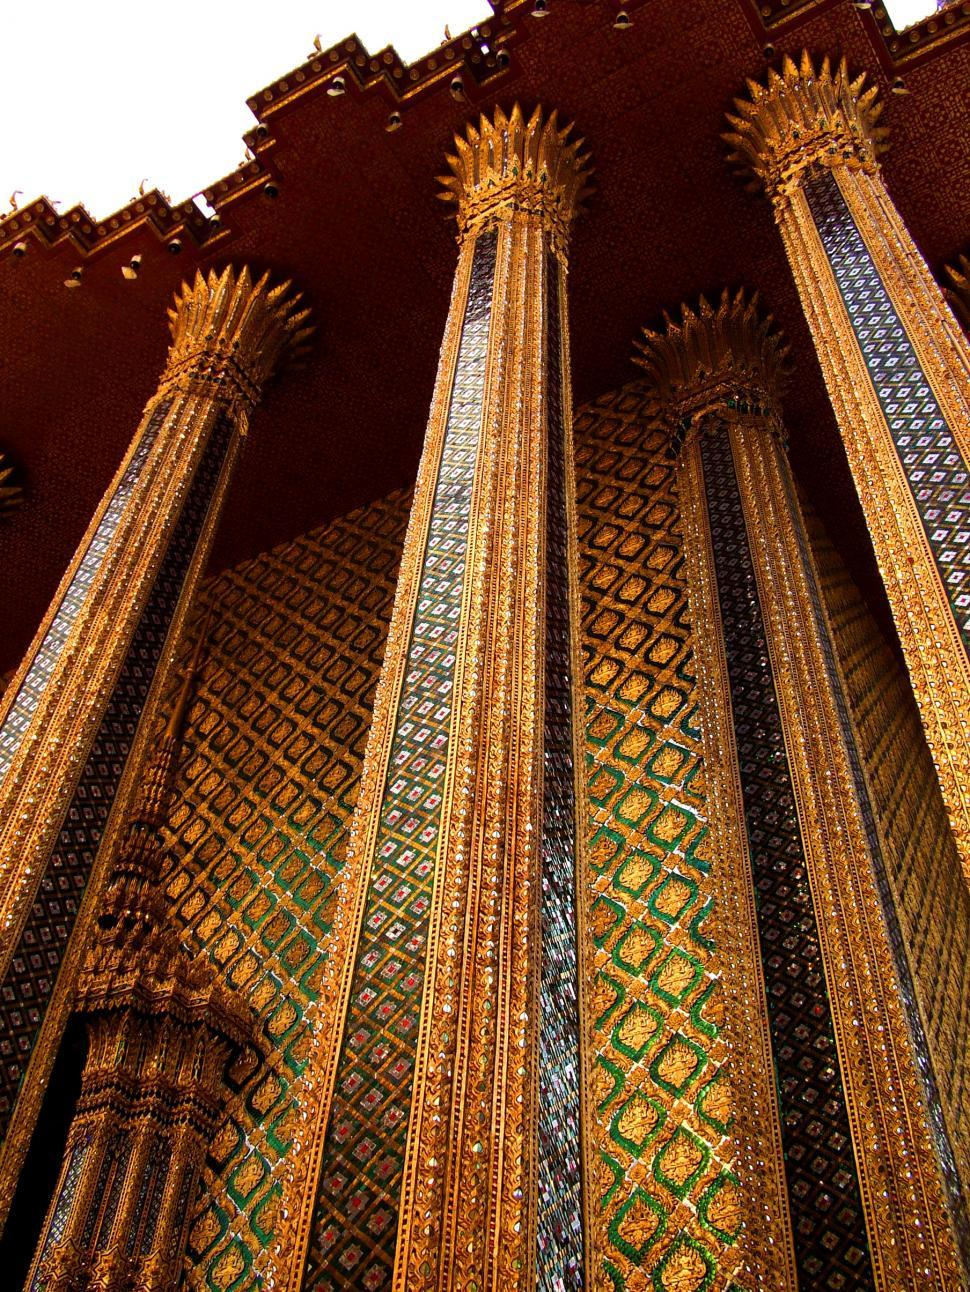 Download Free Stock HD Photo of Thailand - Columns of Phra Mondop in Bangkok Online